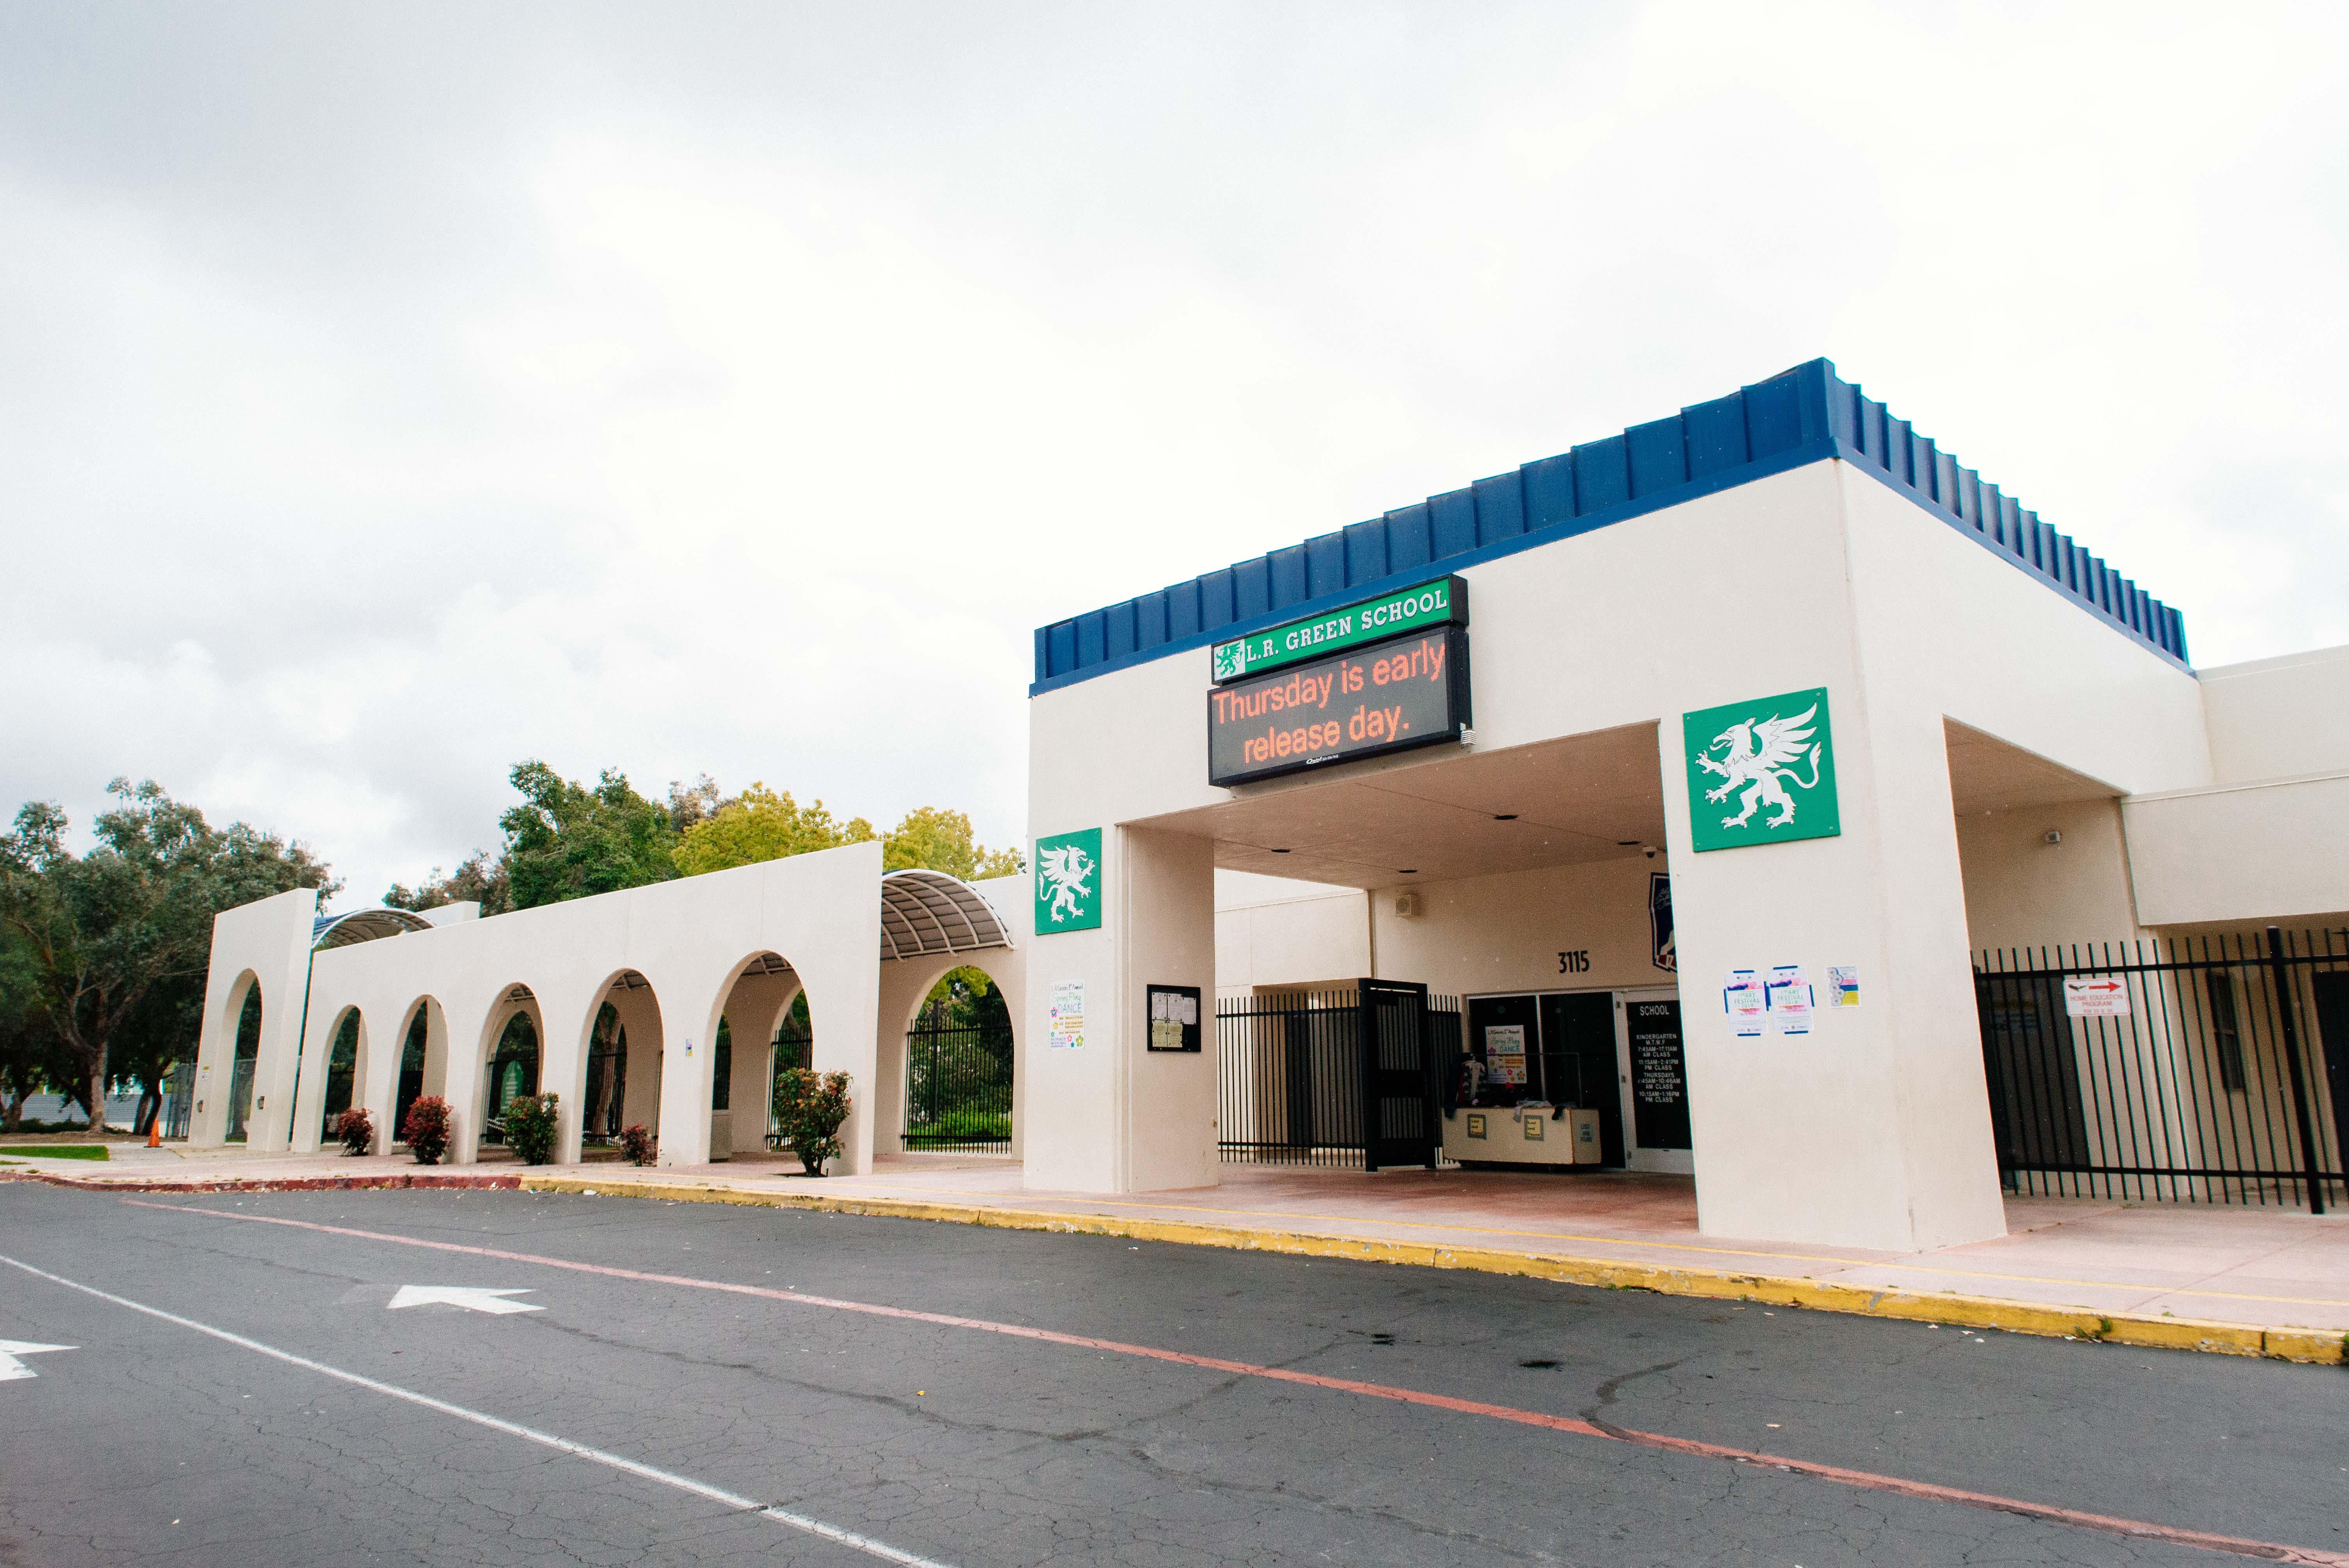 L.R. Green Elementary